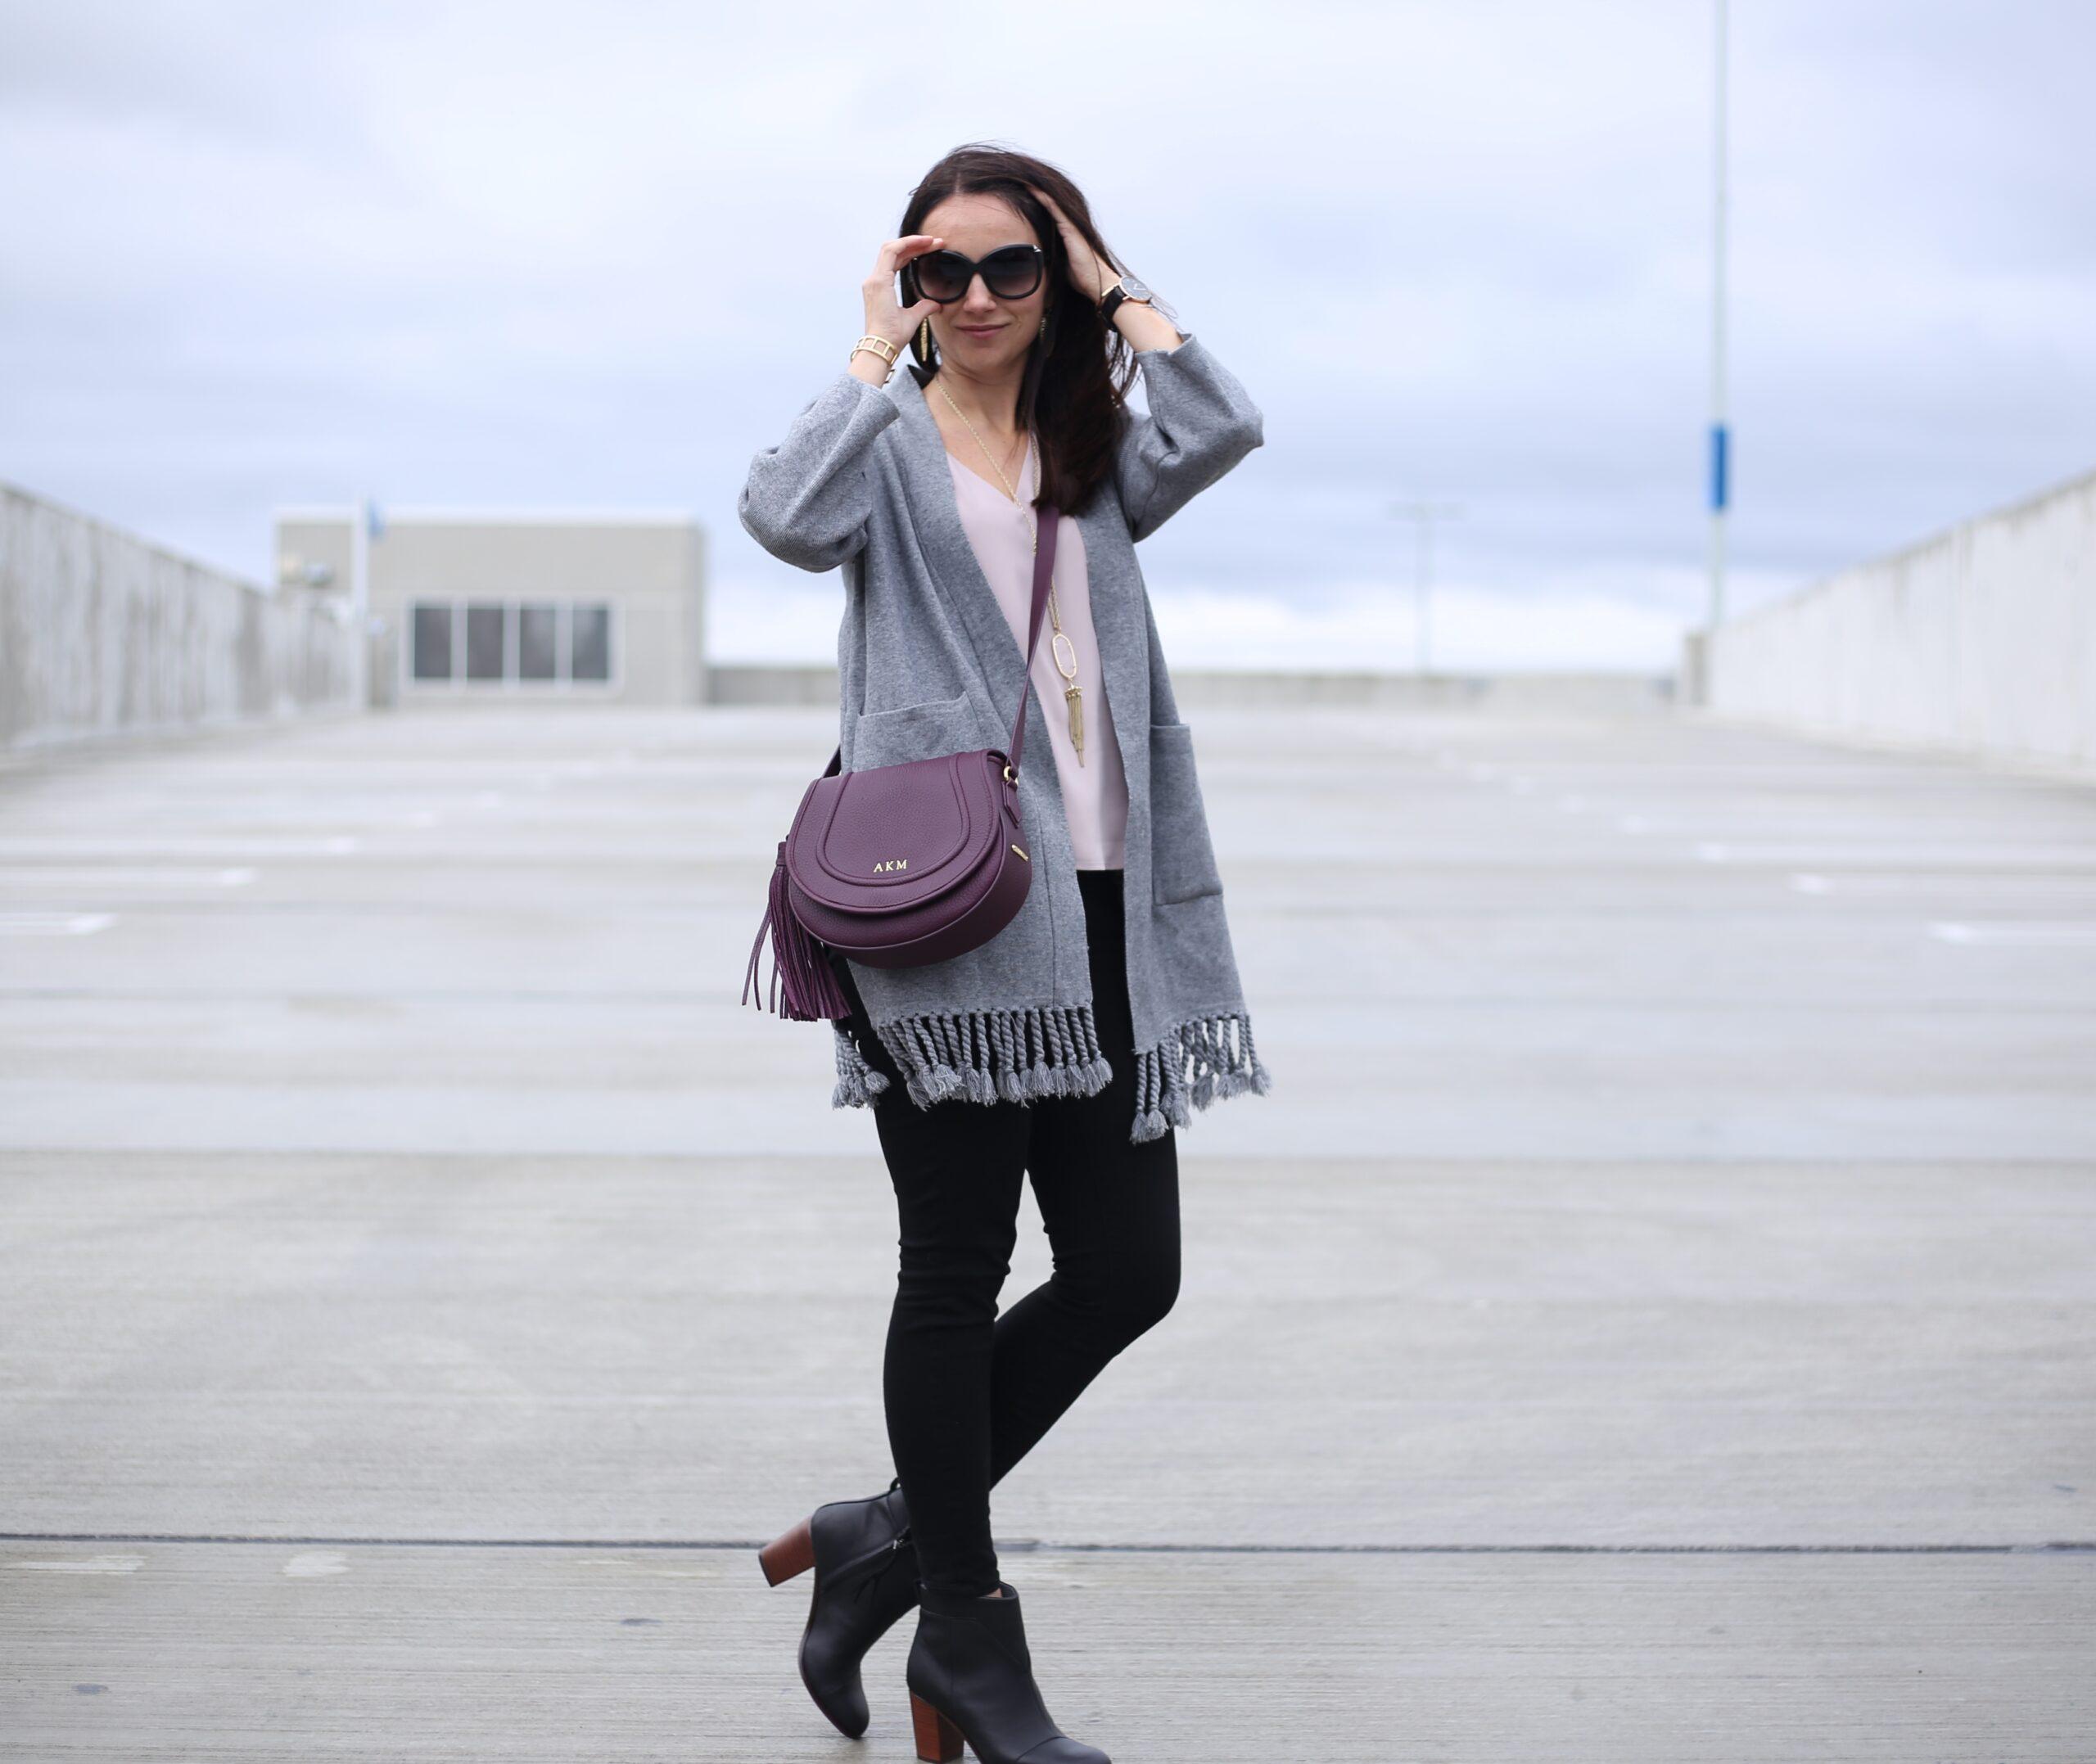 fall outfit crossbody bag